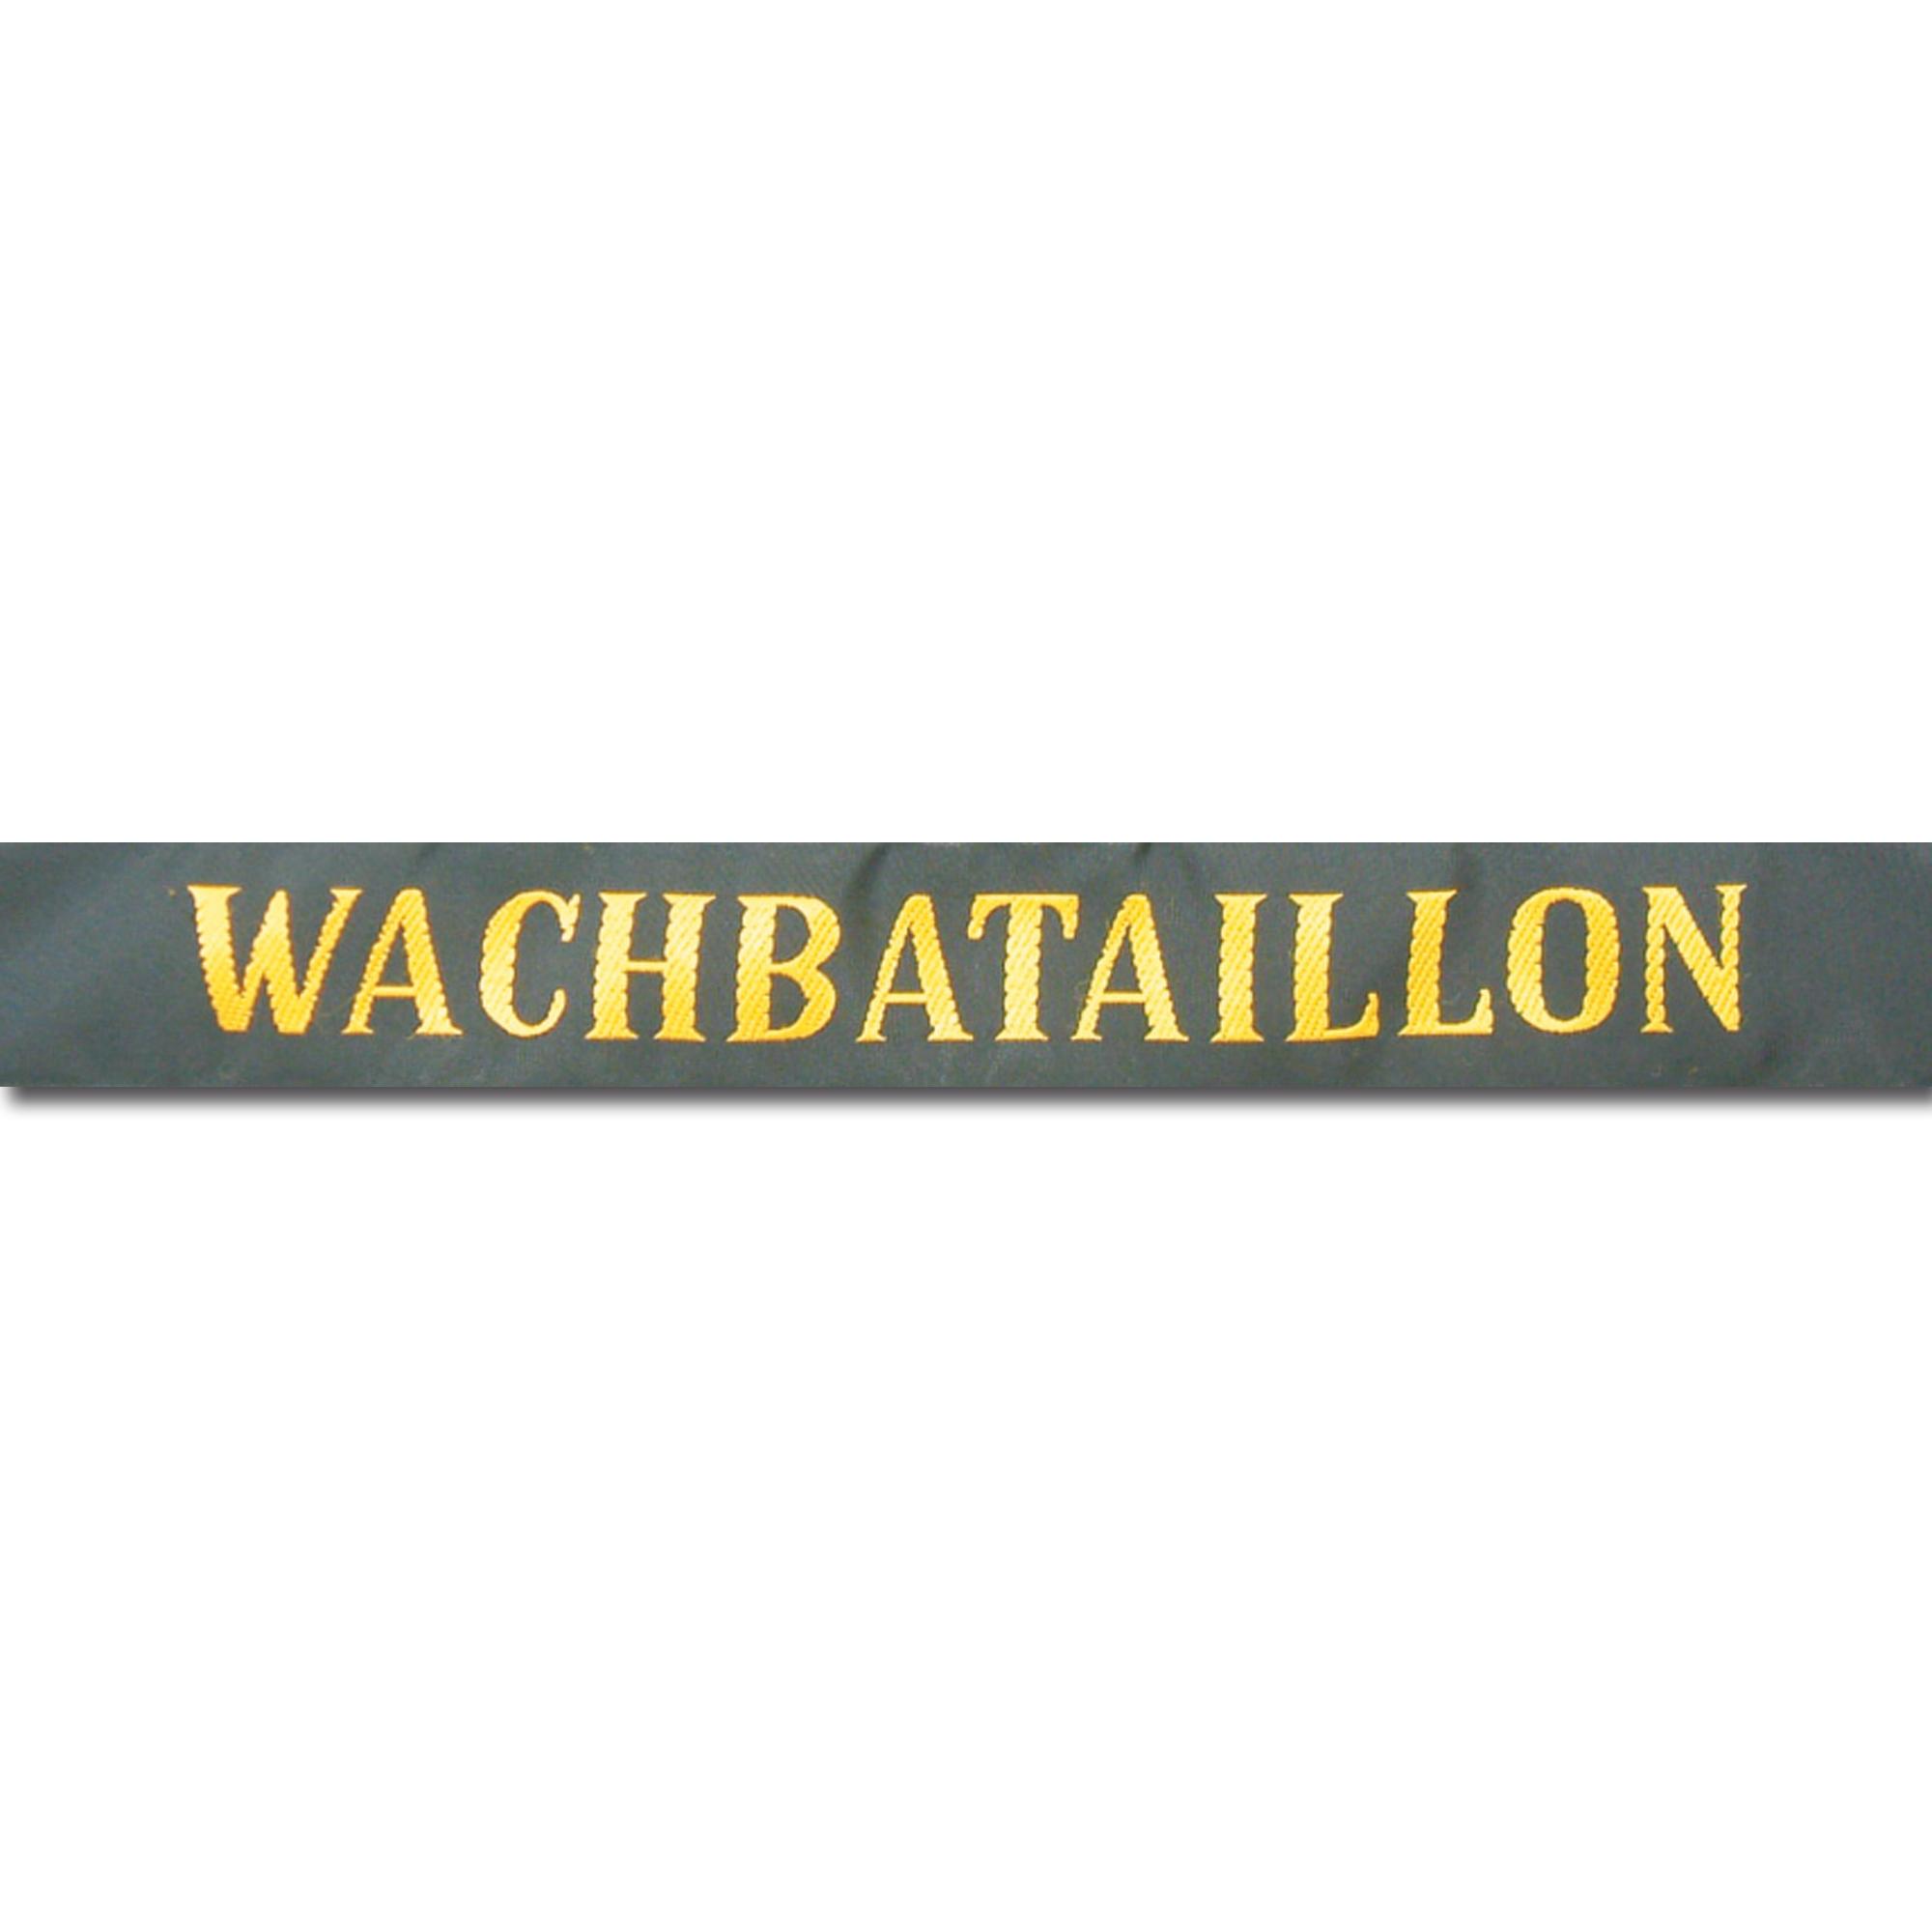 Banda para gorra Wachbataillon